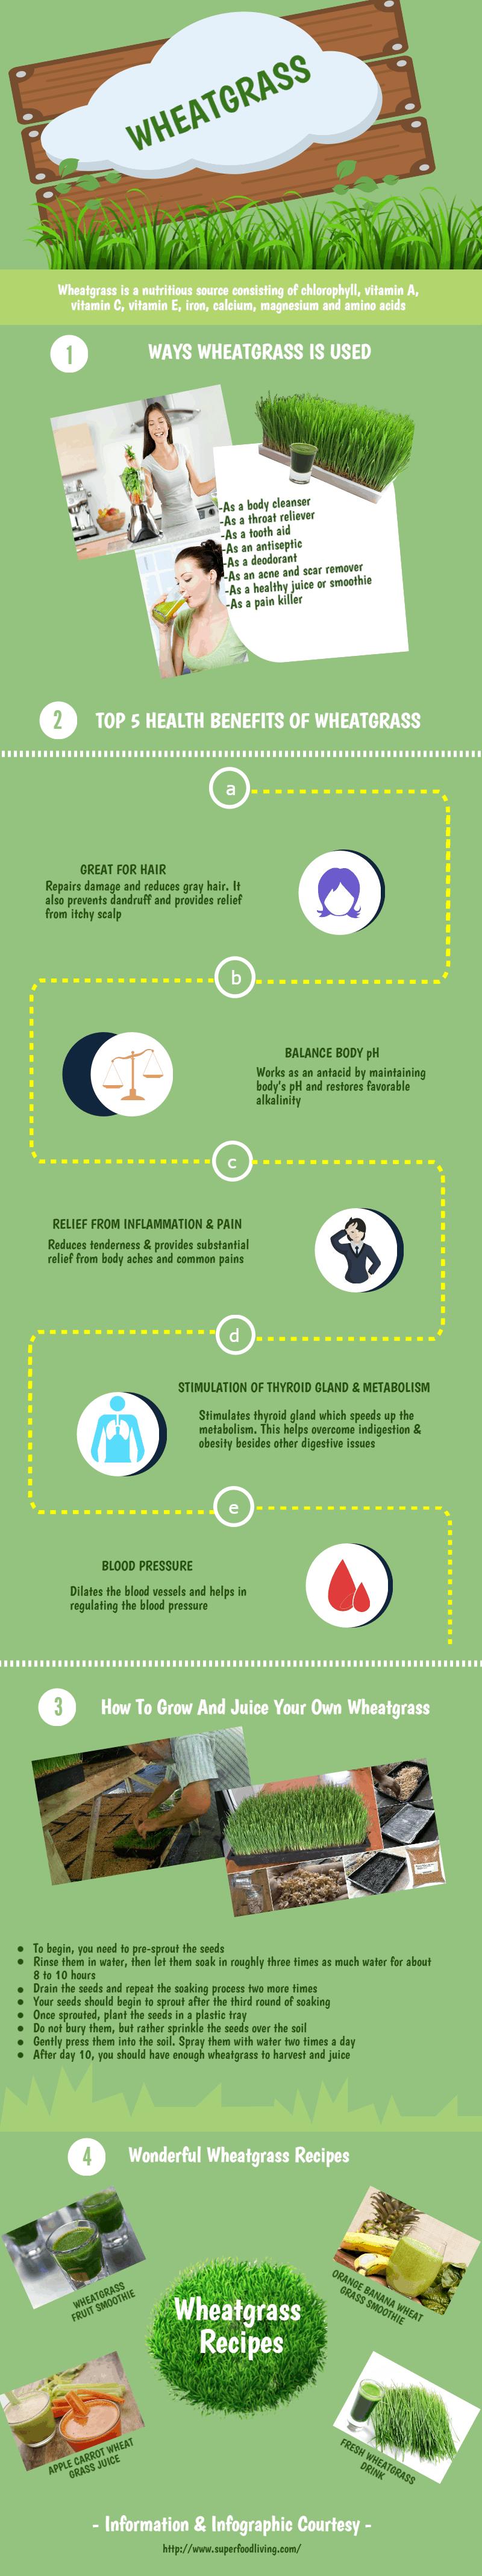 wheatgrass-Infographic-medictips-health-benefits